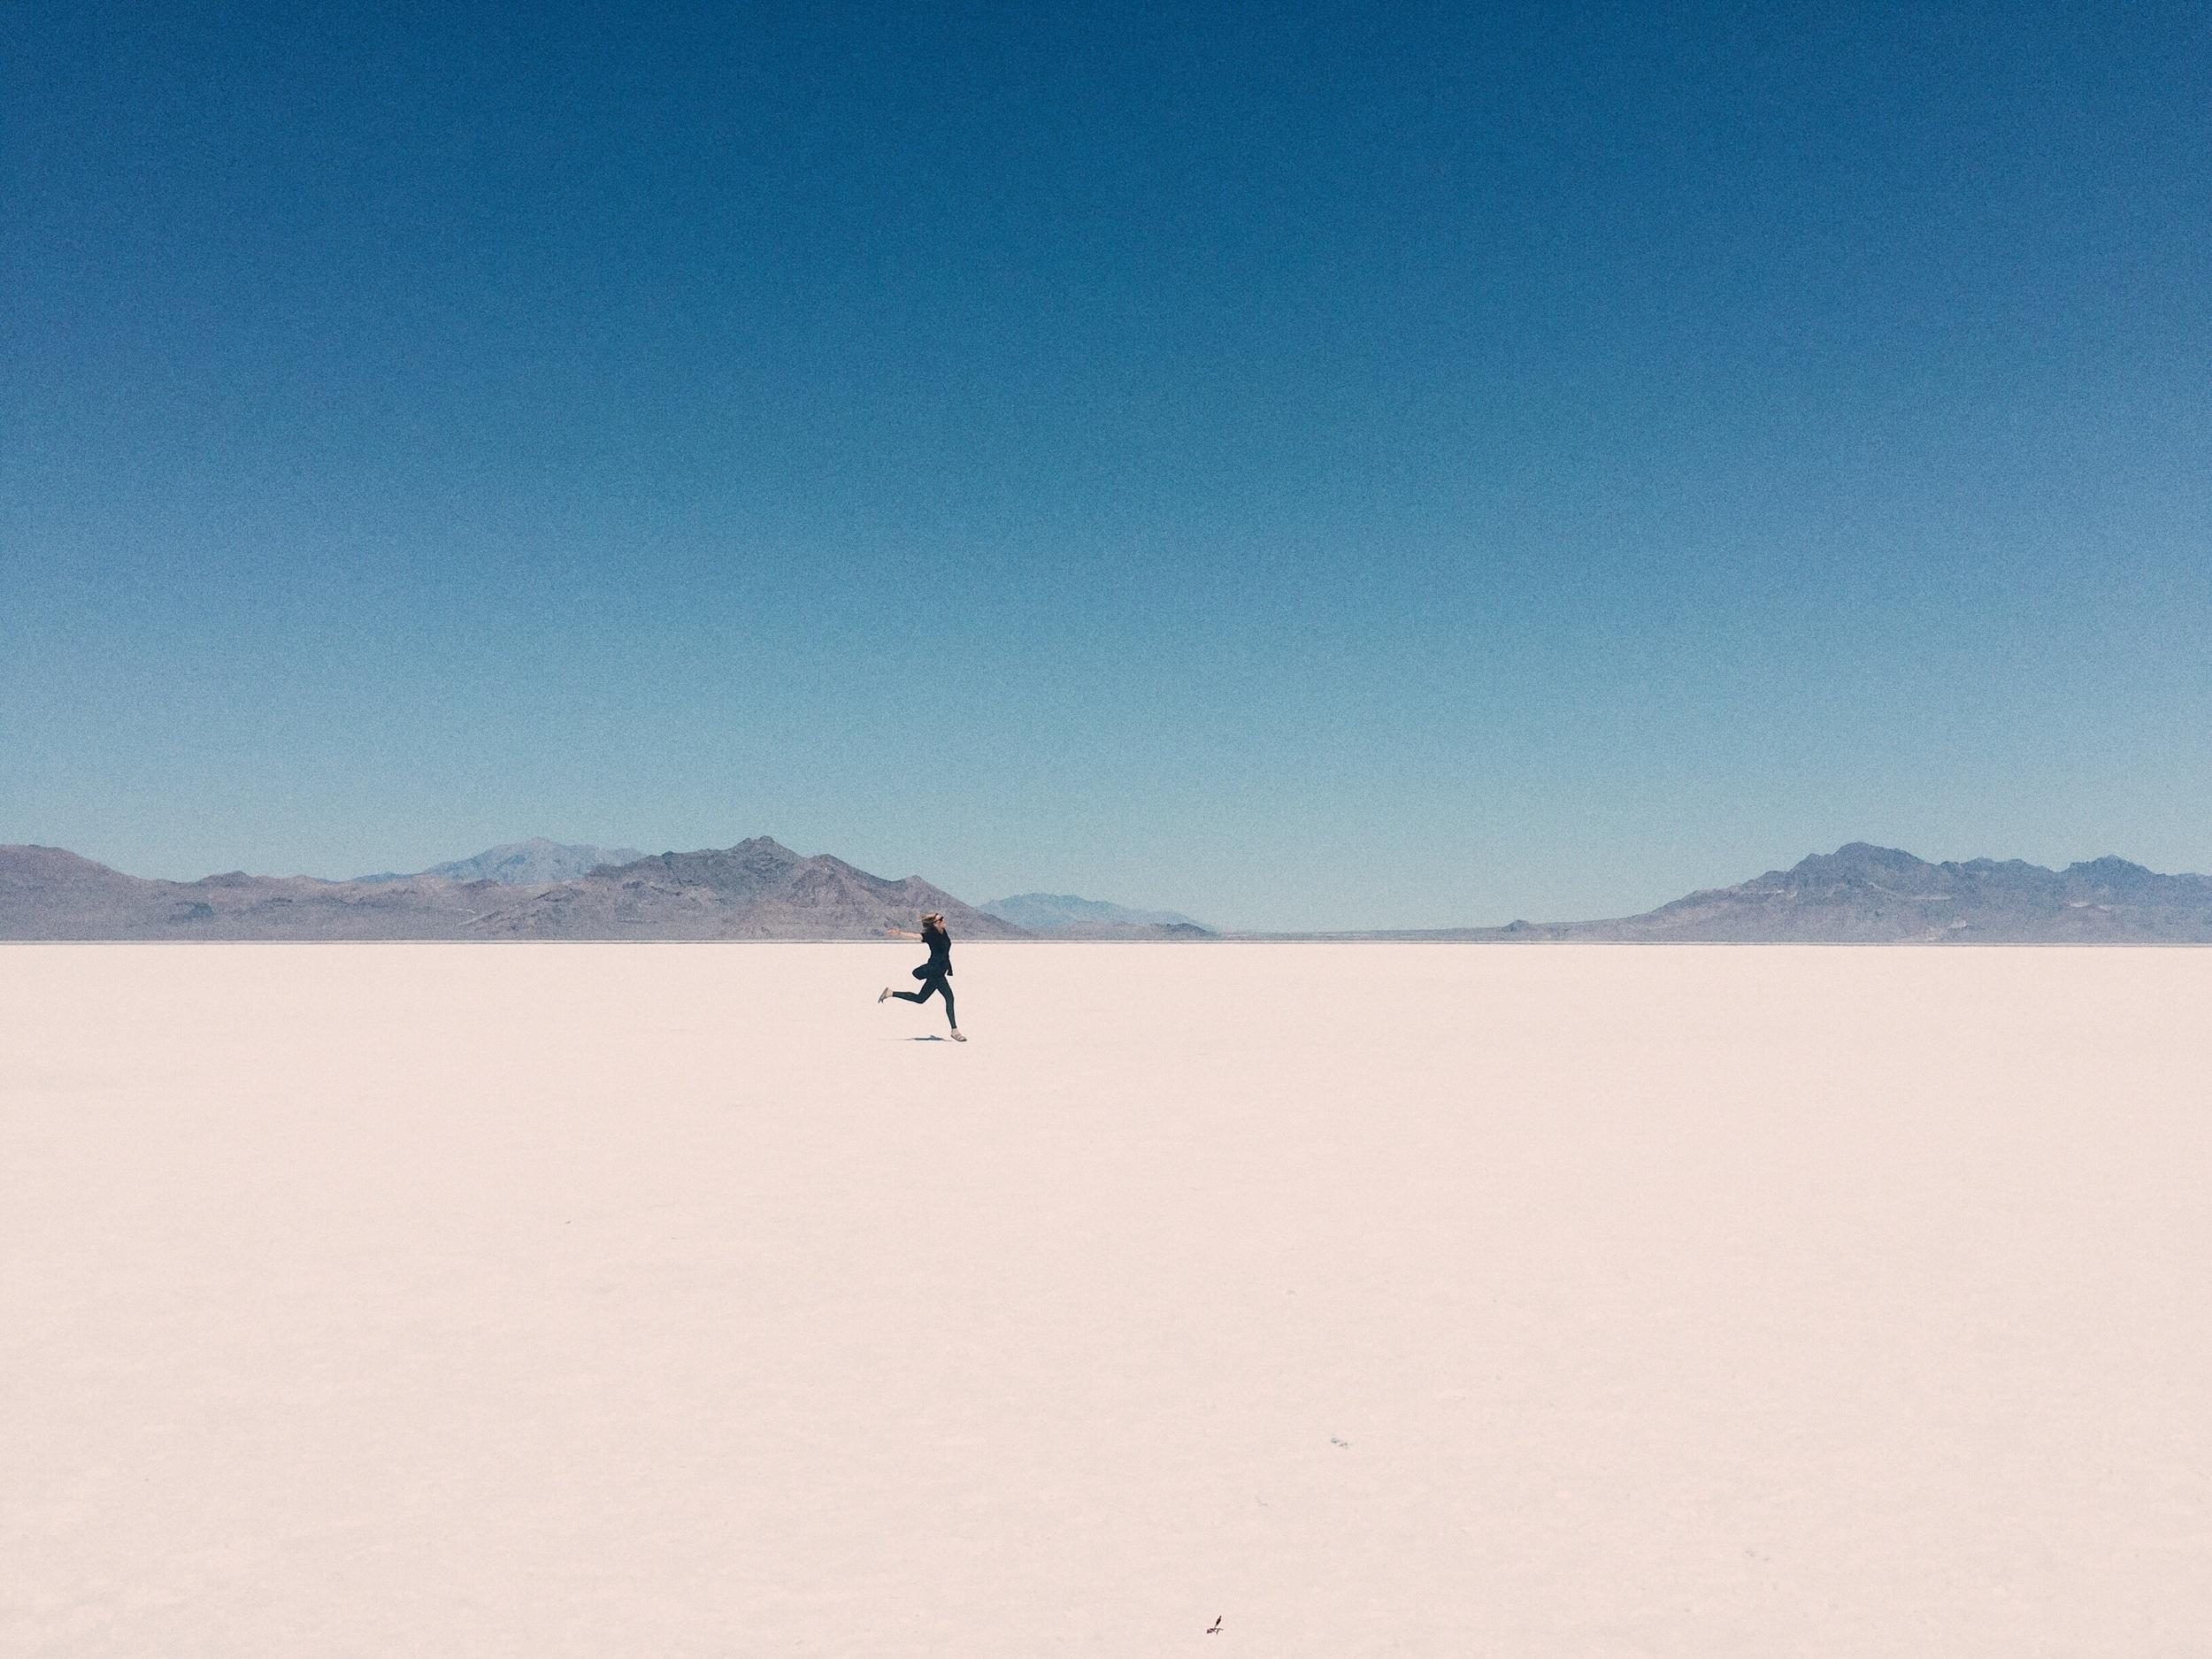 Salt Flats in Utah, July '15